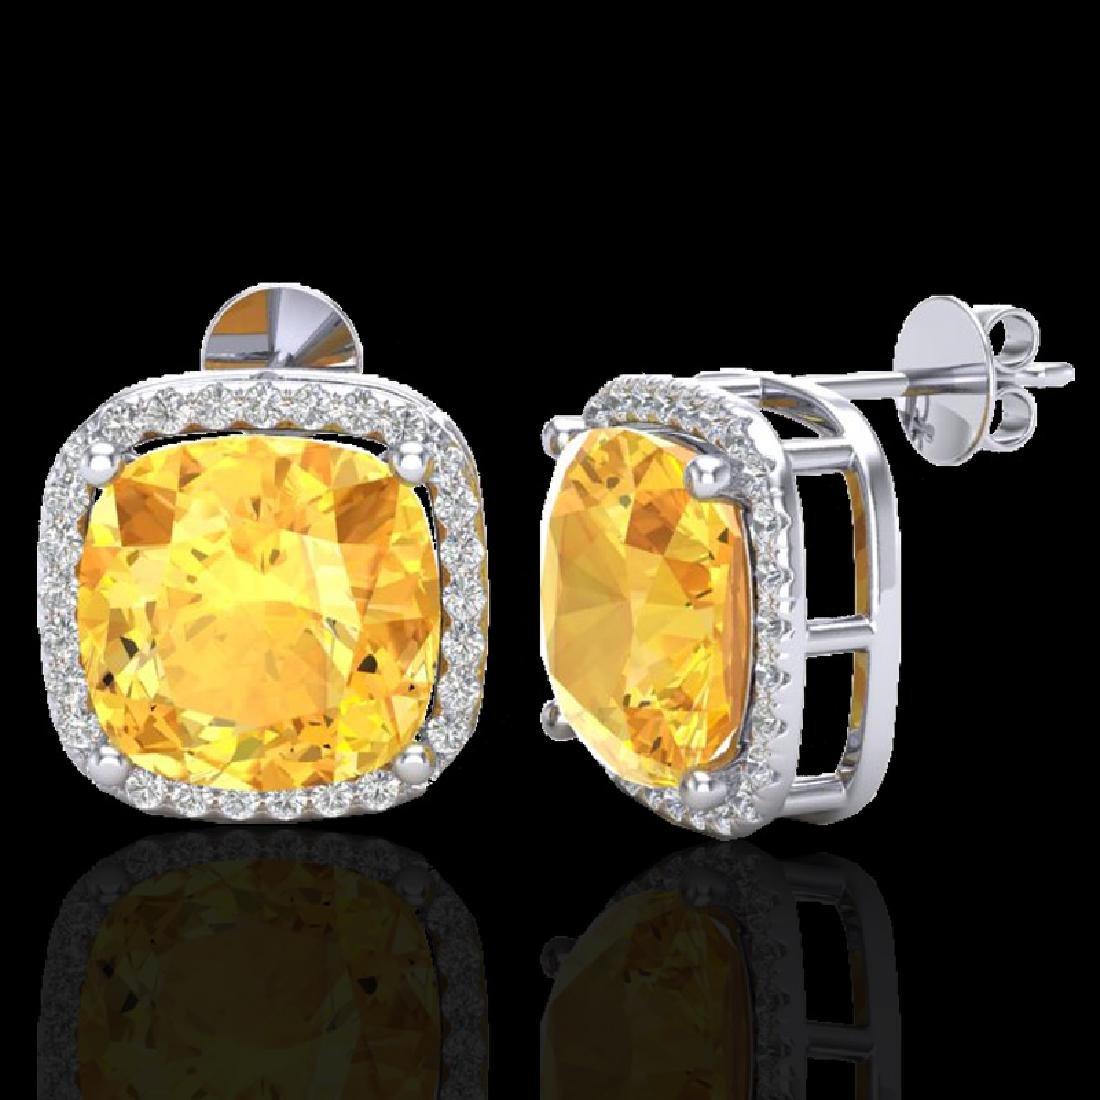 12 CTW Citrine & Micro Pave Halo VS/SI Diamond Earrings - 2